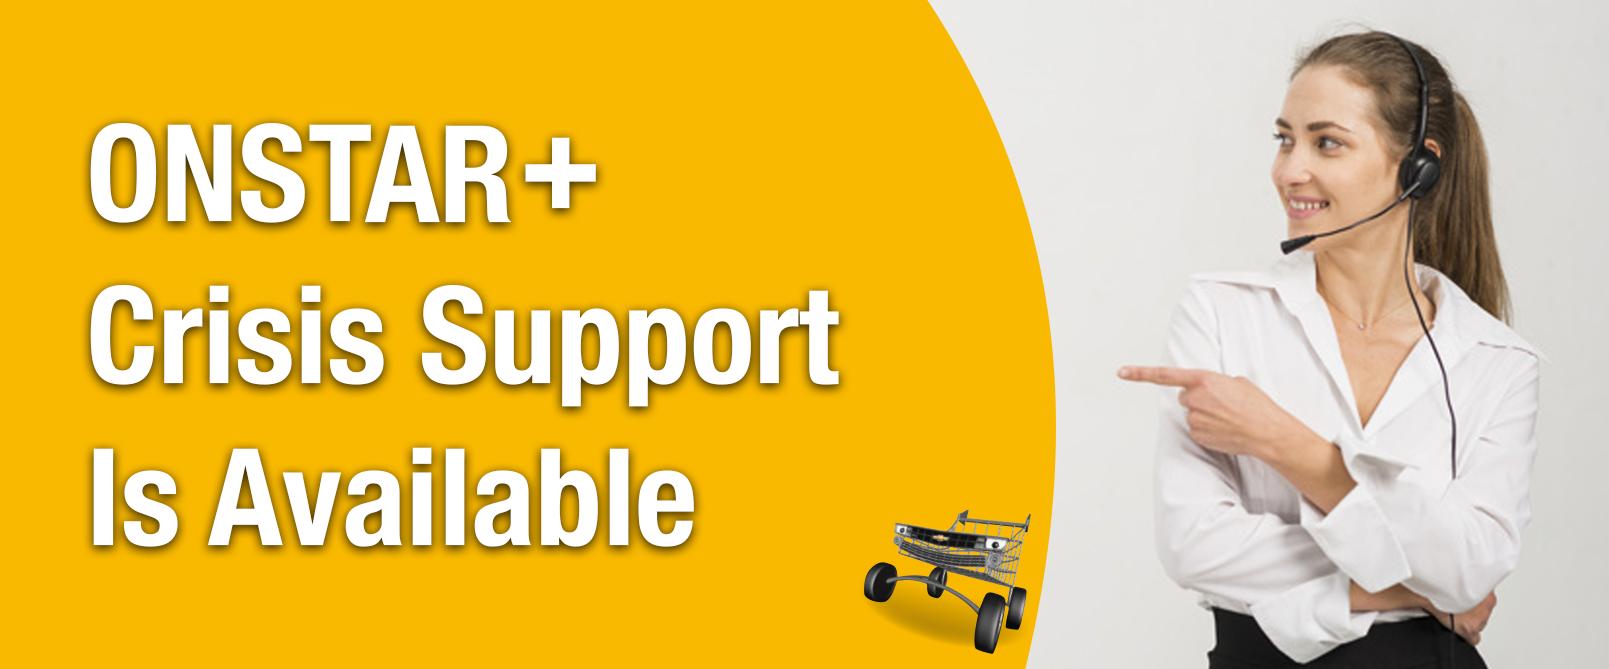 ONSTAR+ Crisis Assist - 24/7 Support